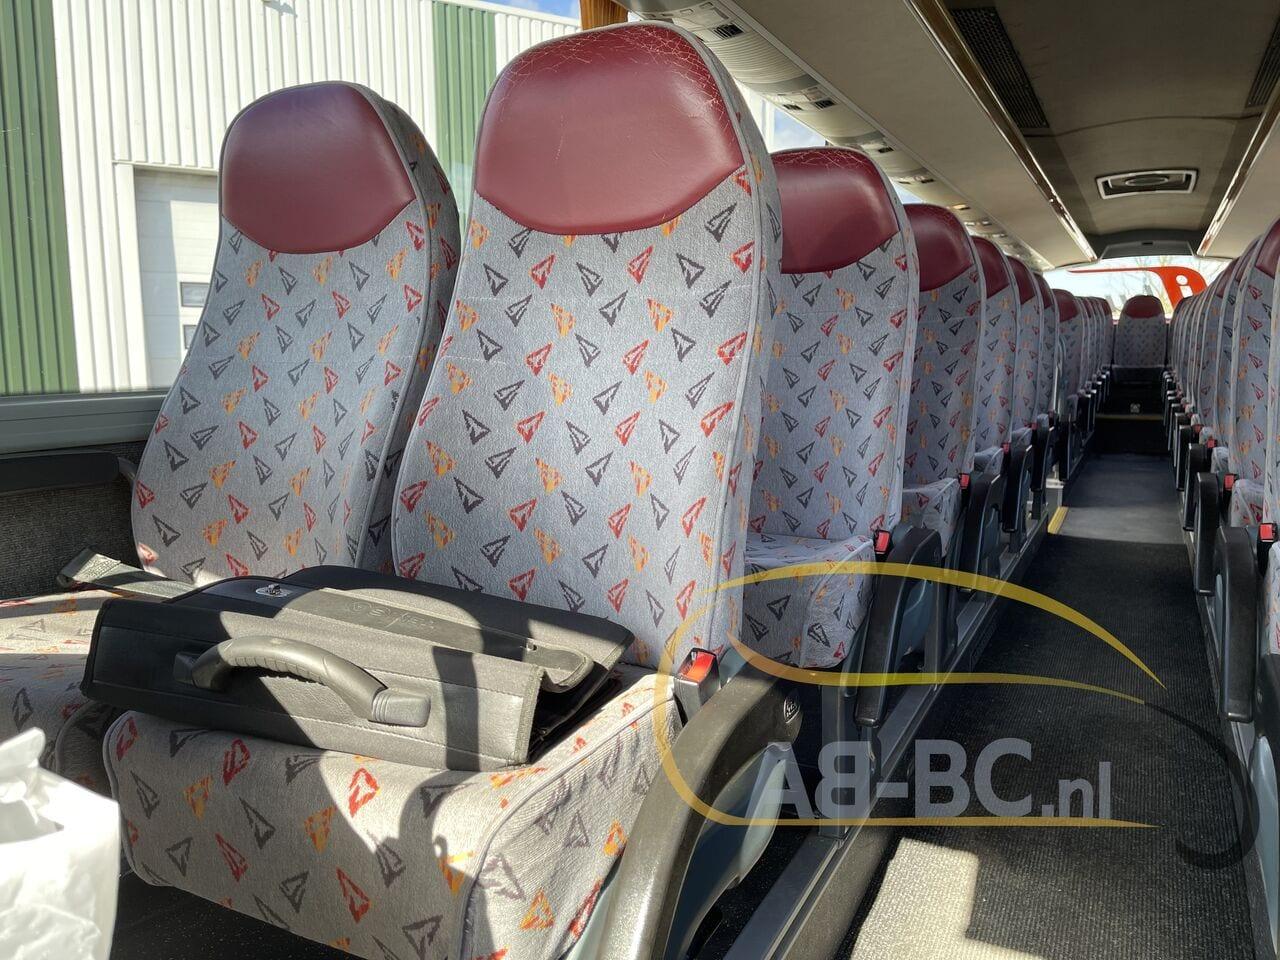 coach-busTEMSA-Safari-RD-53-Seats-DAF-Motor-12-mtr---1616166761340370860_big_bd6289138149c2ae4212282e16310694--21031917053743807500